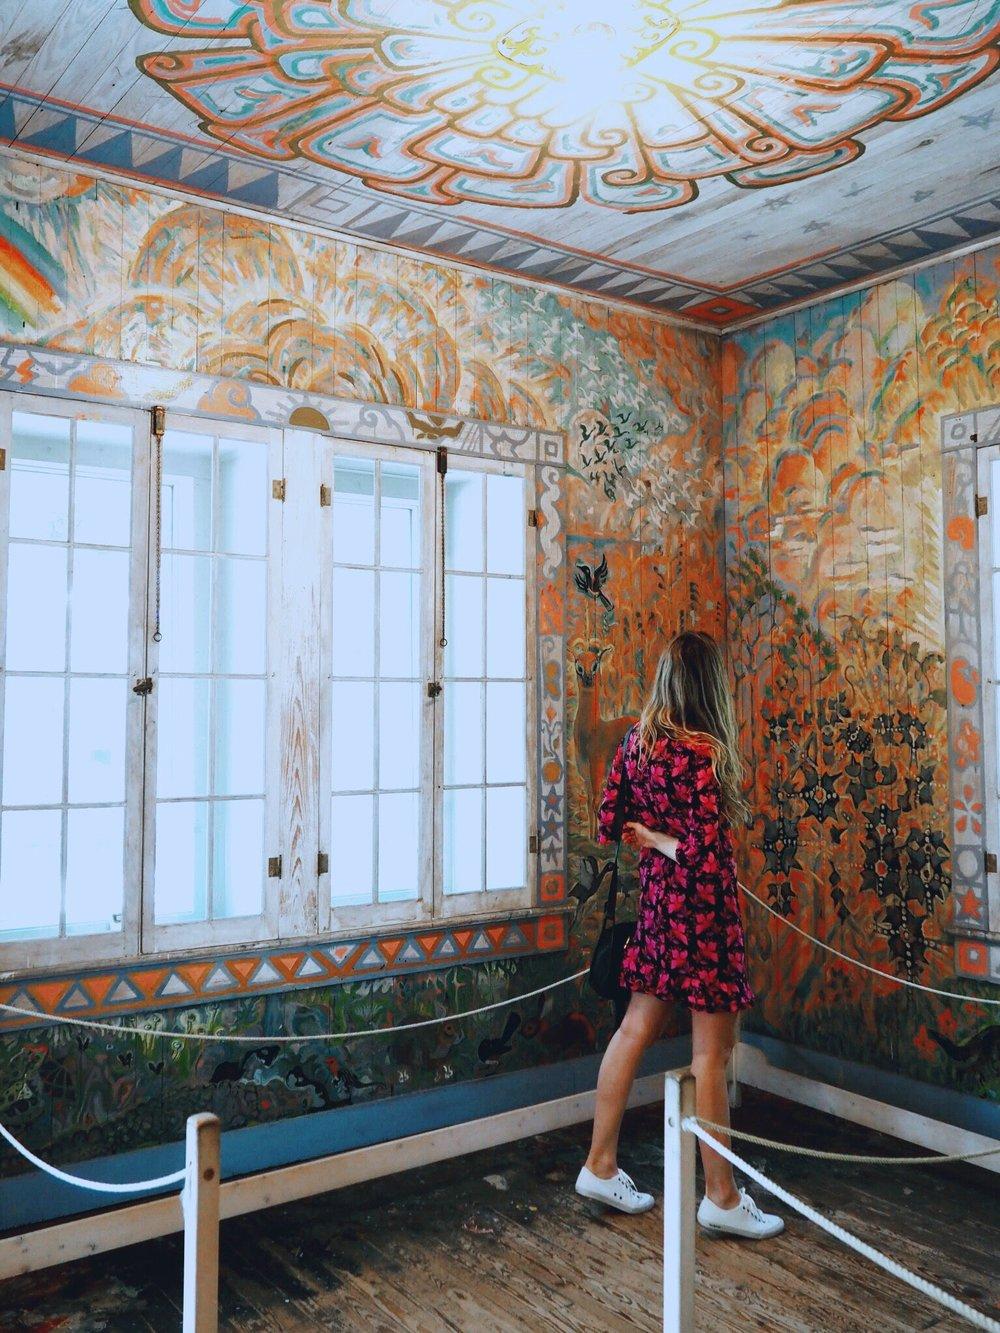 WA Museum | Oui We